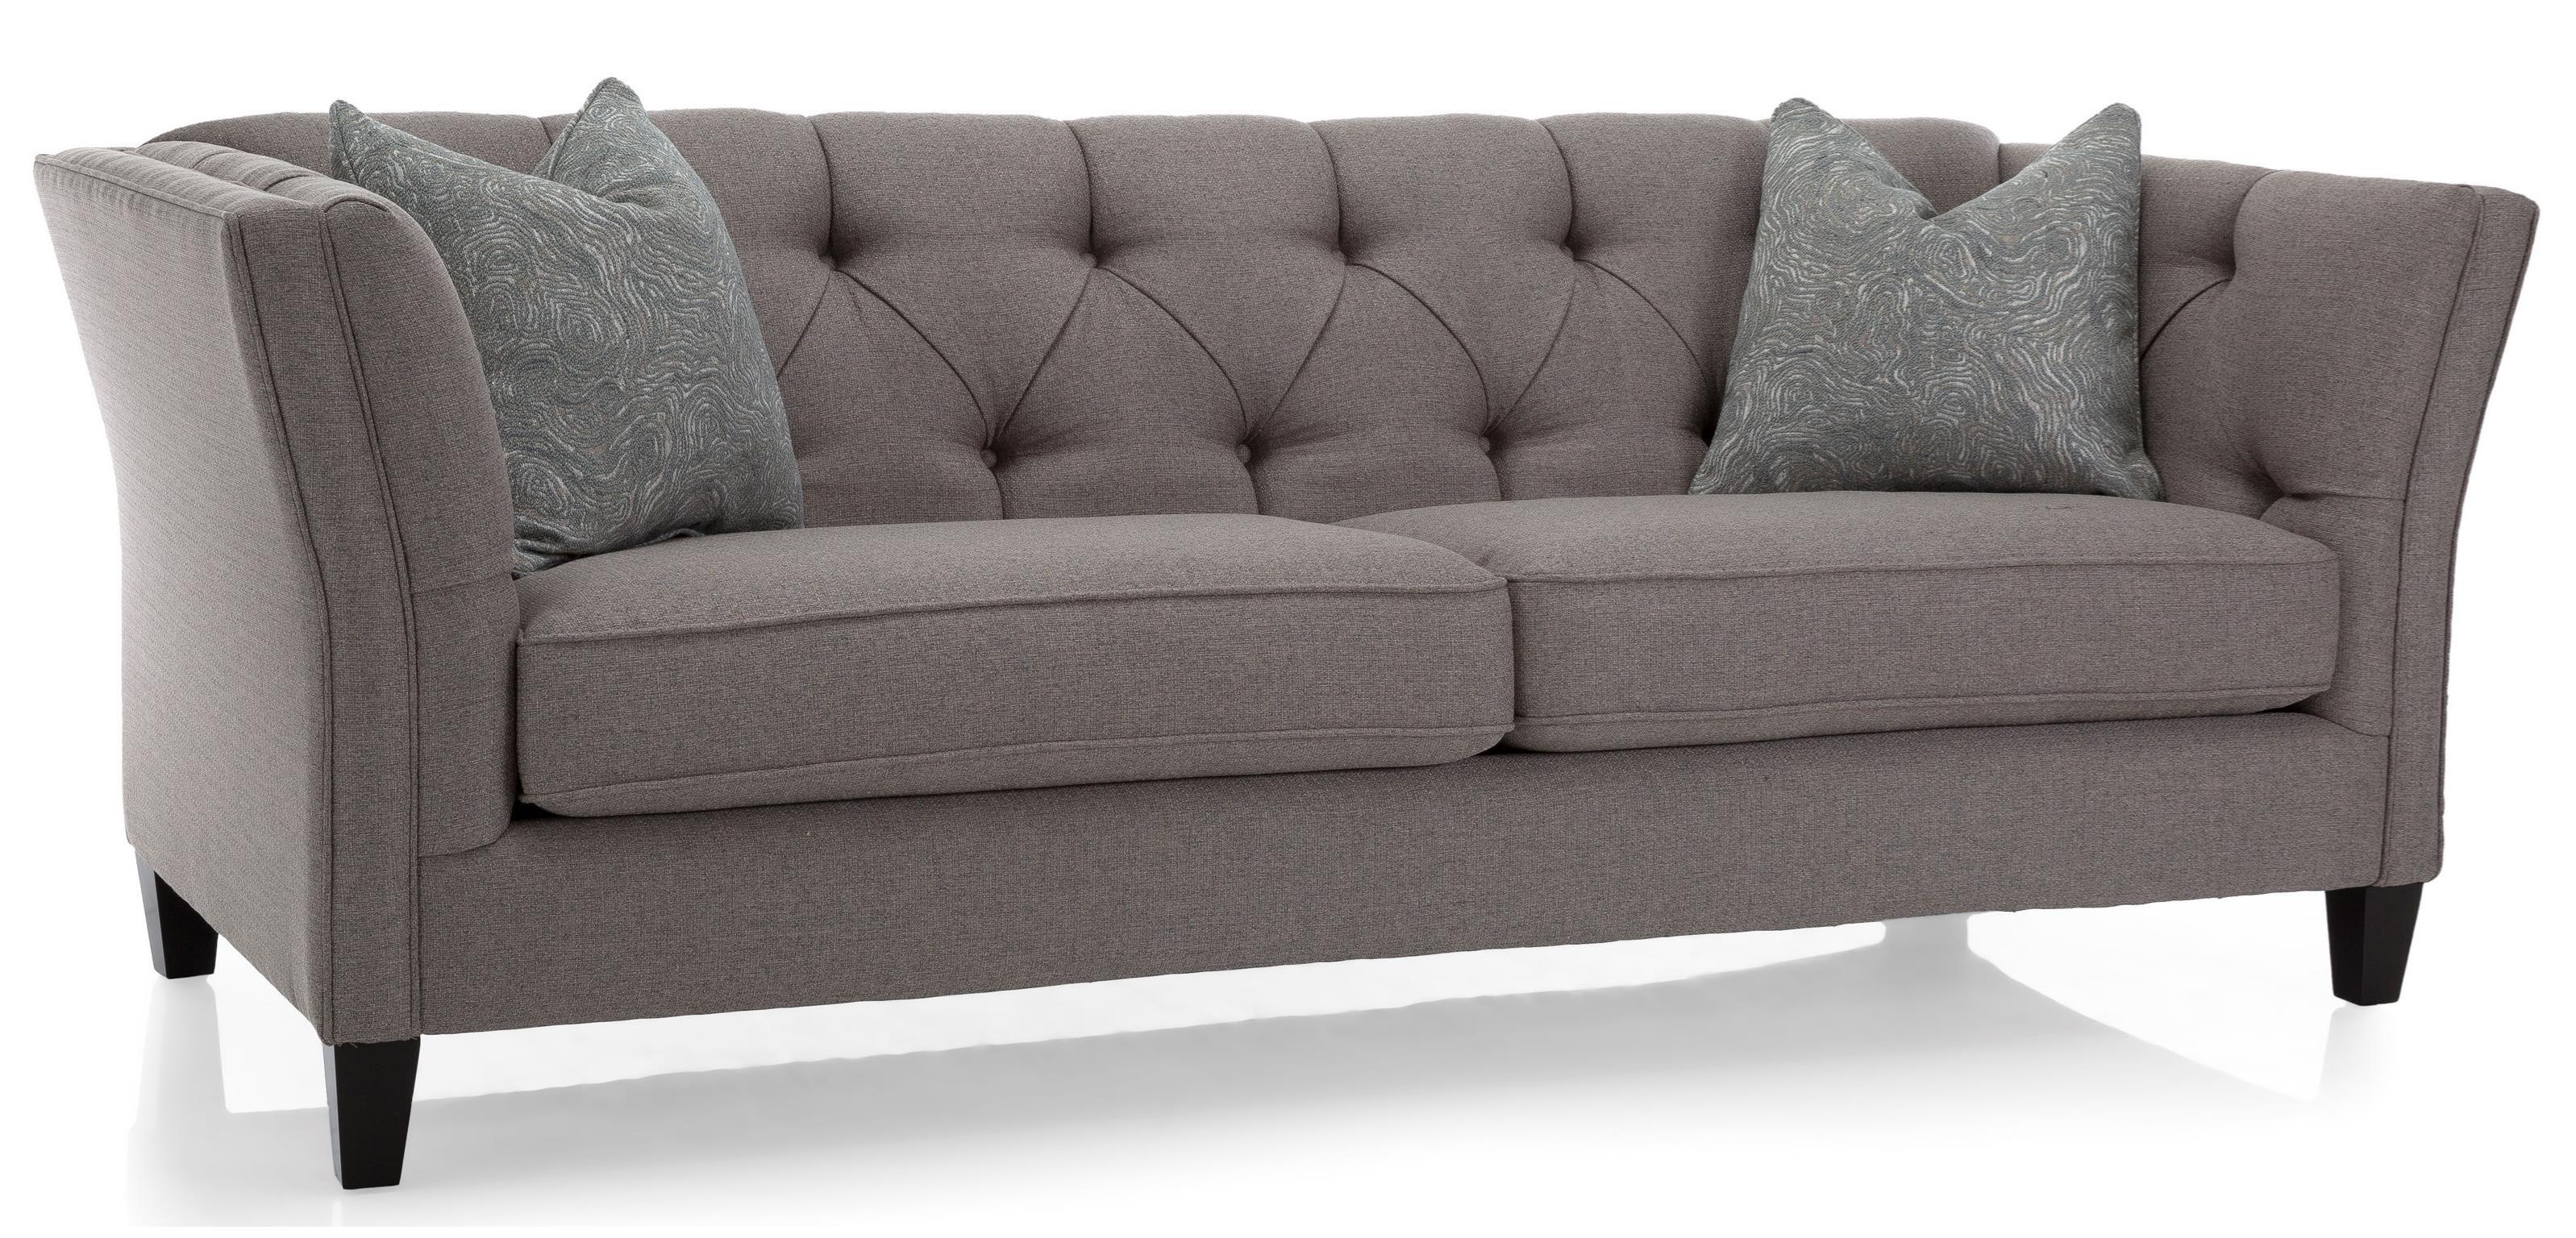 2555 Sofa by Decor-Rest at Johnny Janosik